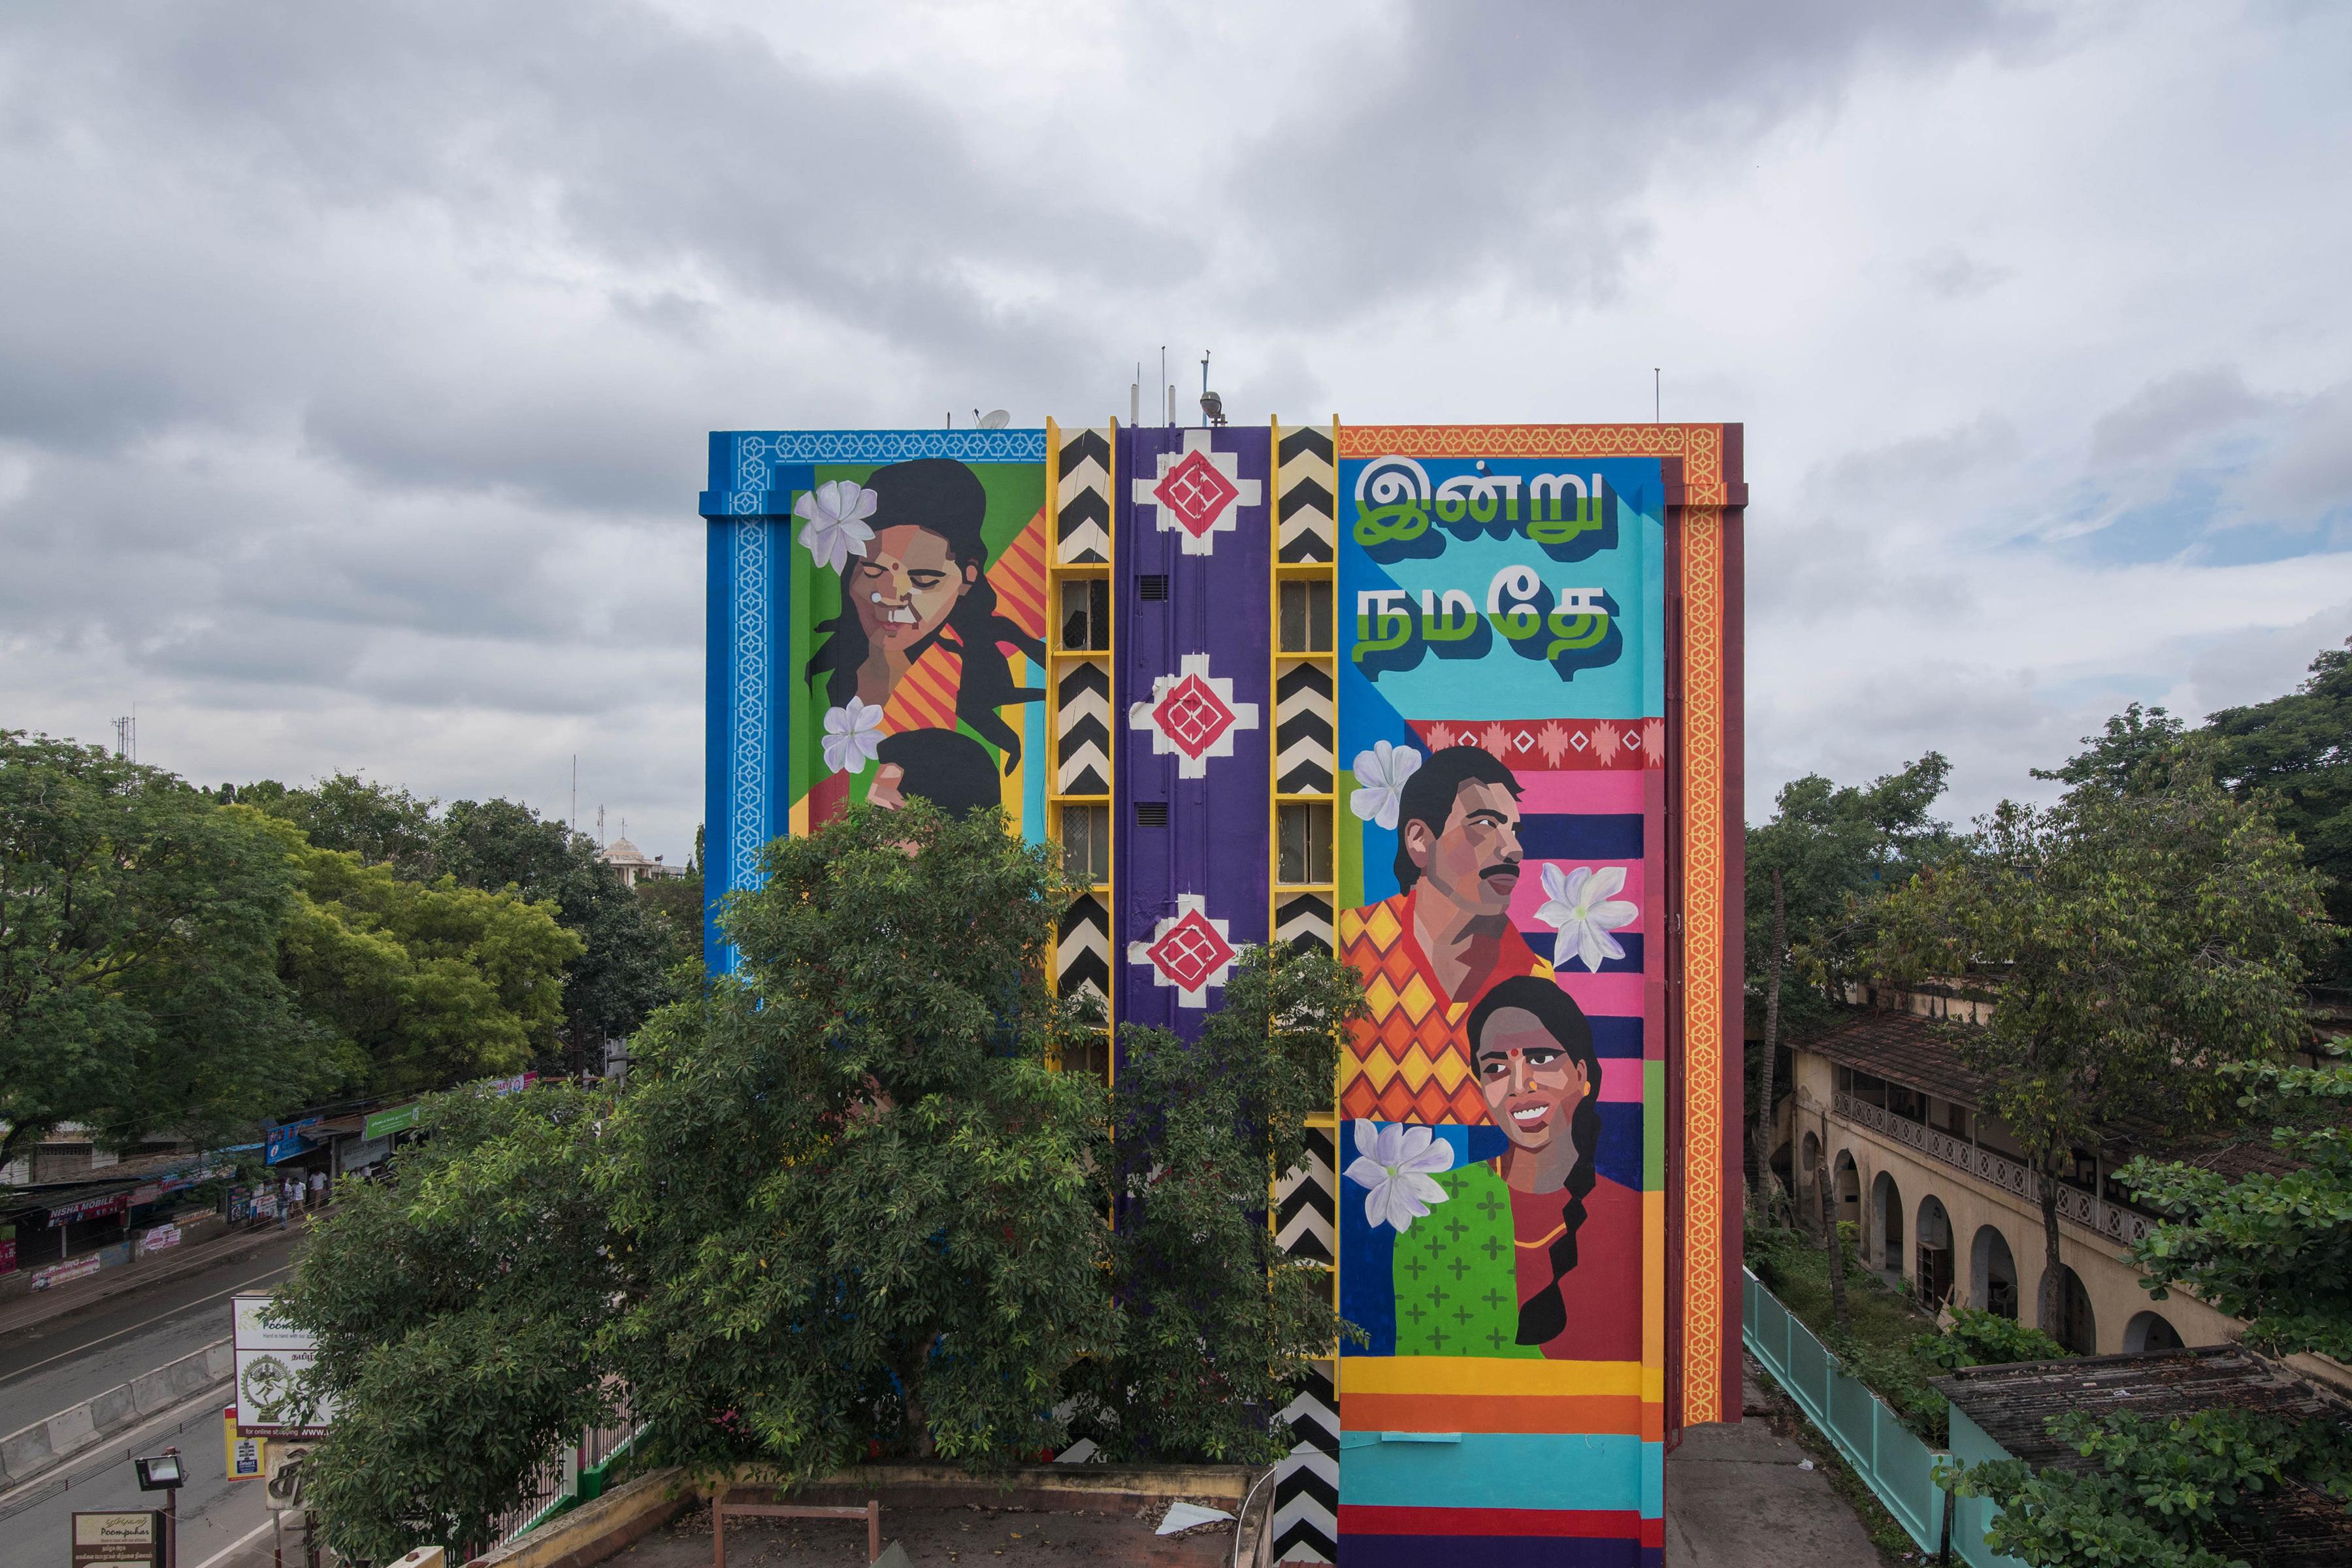 Poornima Saadhna Reveals St Art Kovai 2018 Pranav Gohil 6